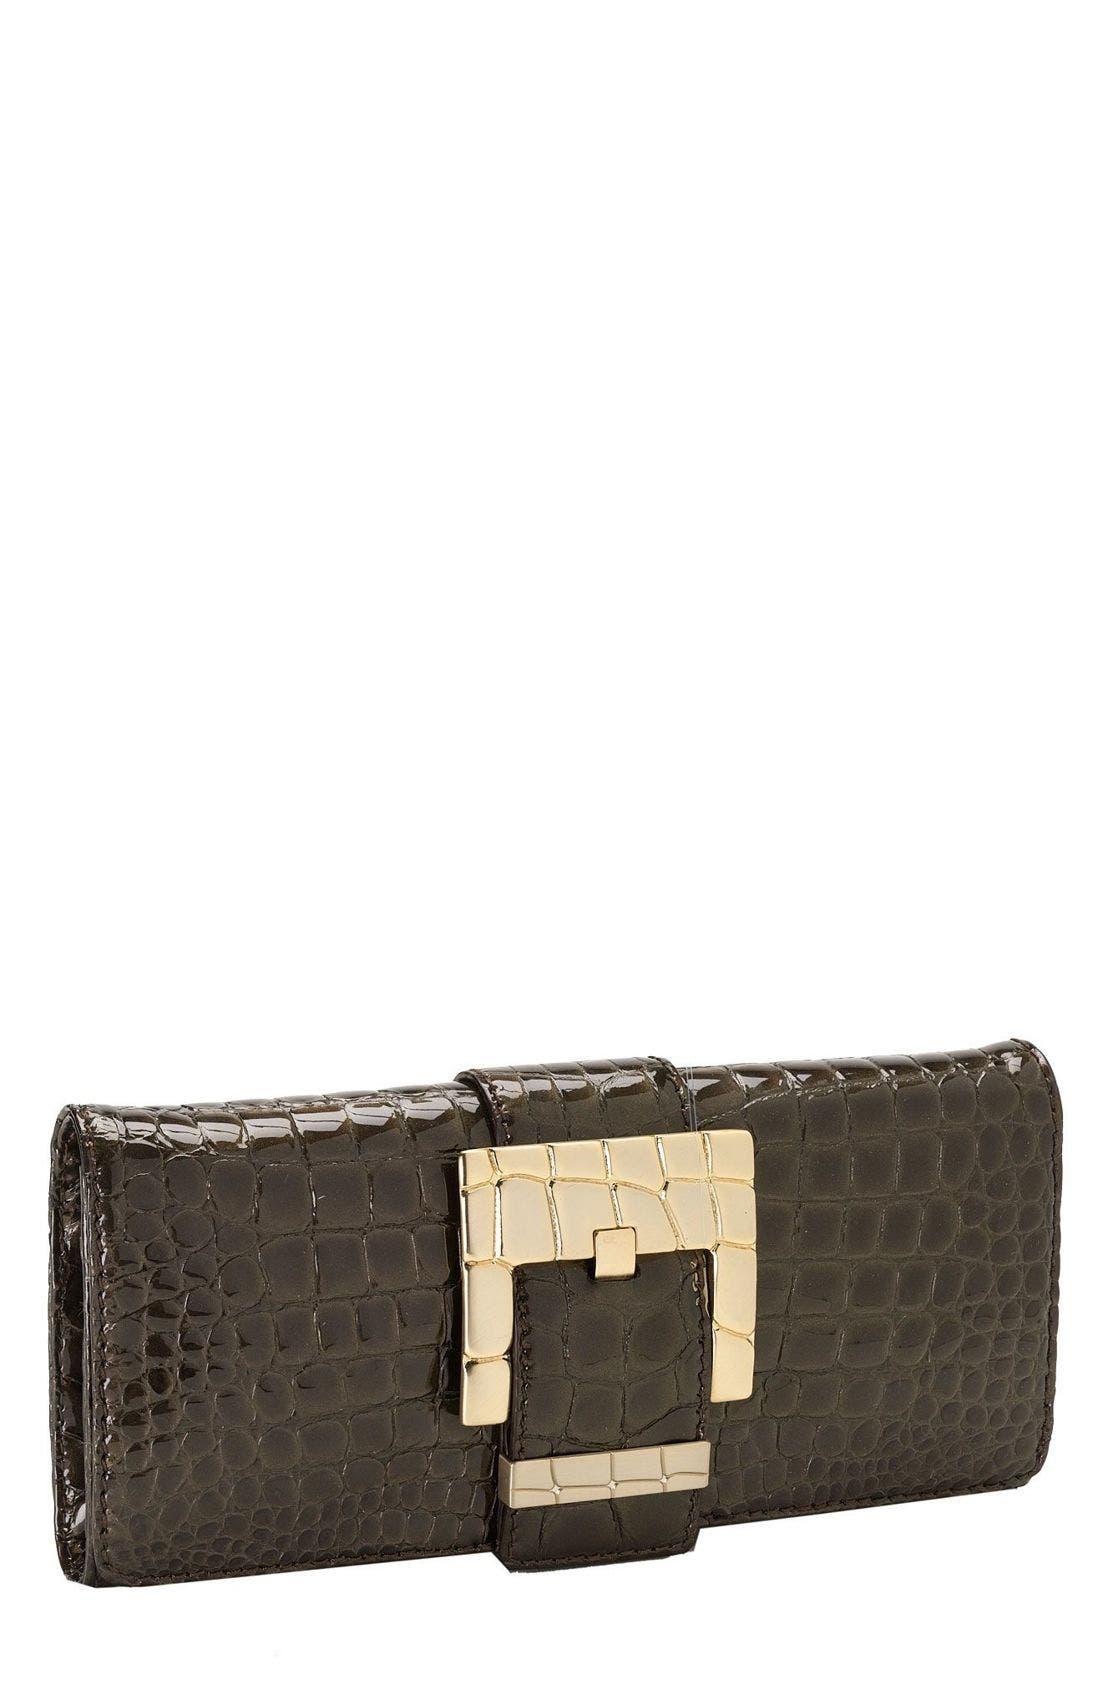 Main Image - MICHAEL Michael Kors 'Peninsula - Patent Croc' Clutch